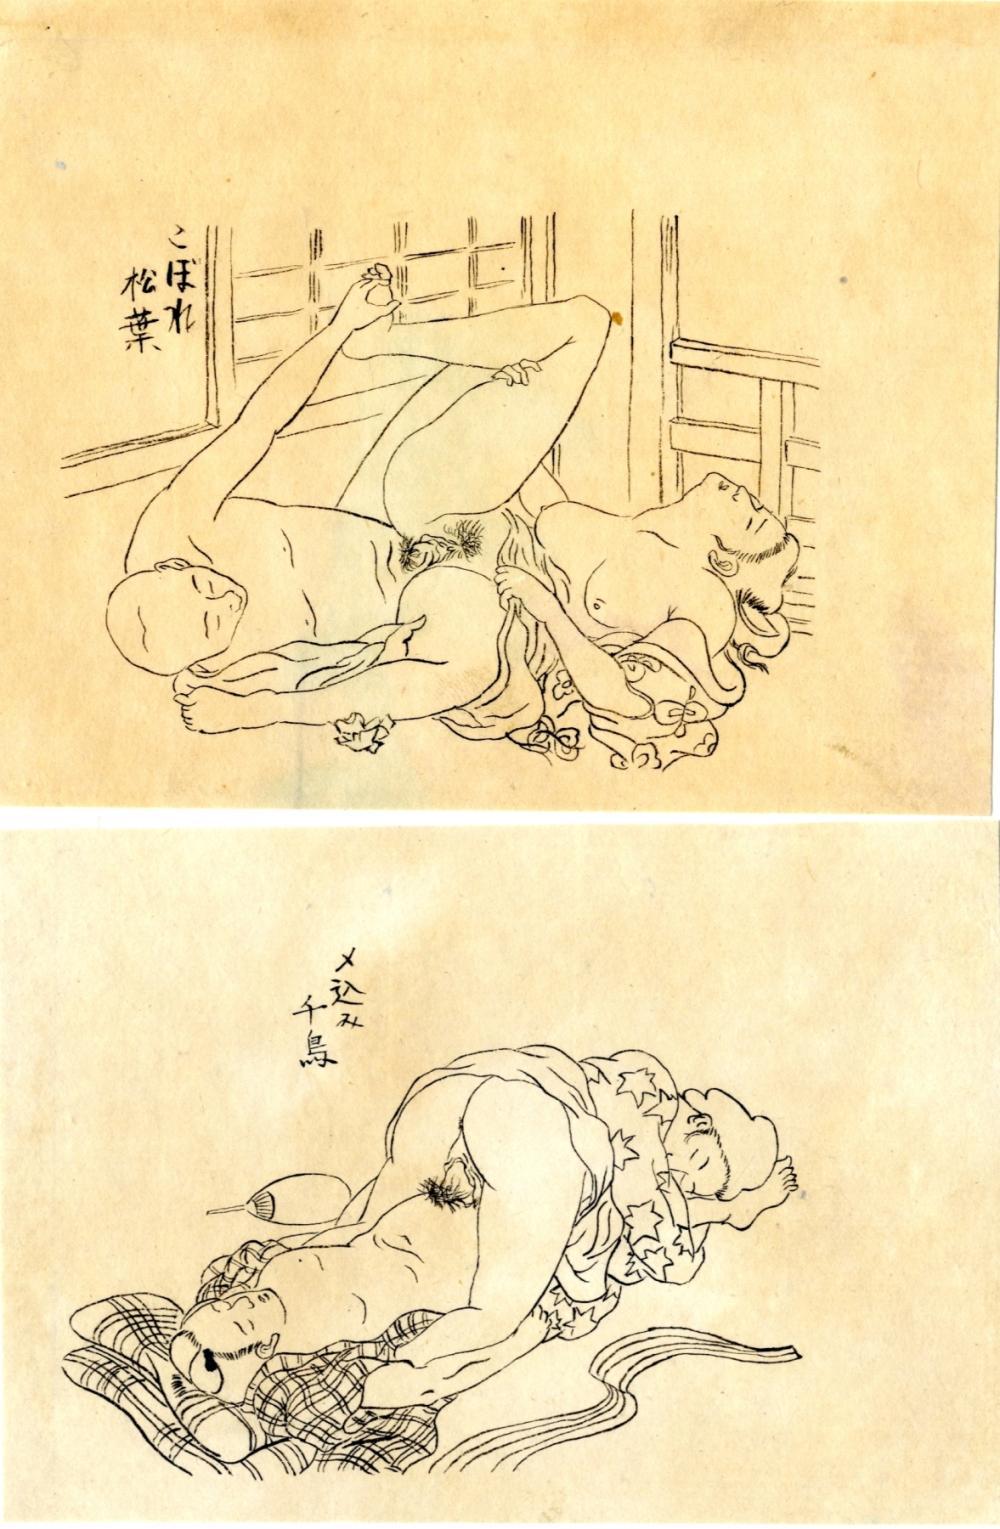 Japanese Woodblock Print, Shunga, two ink drawings, late Meiji or Taisho period